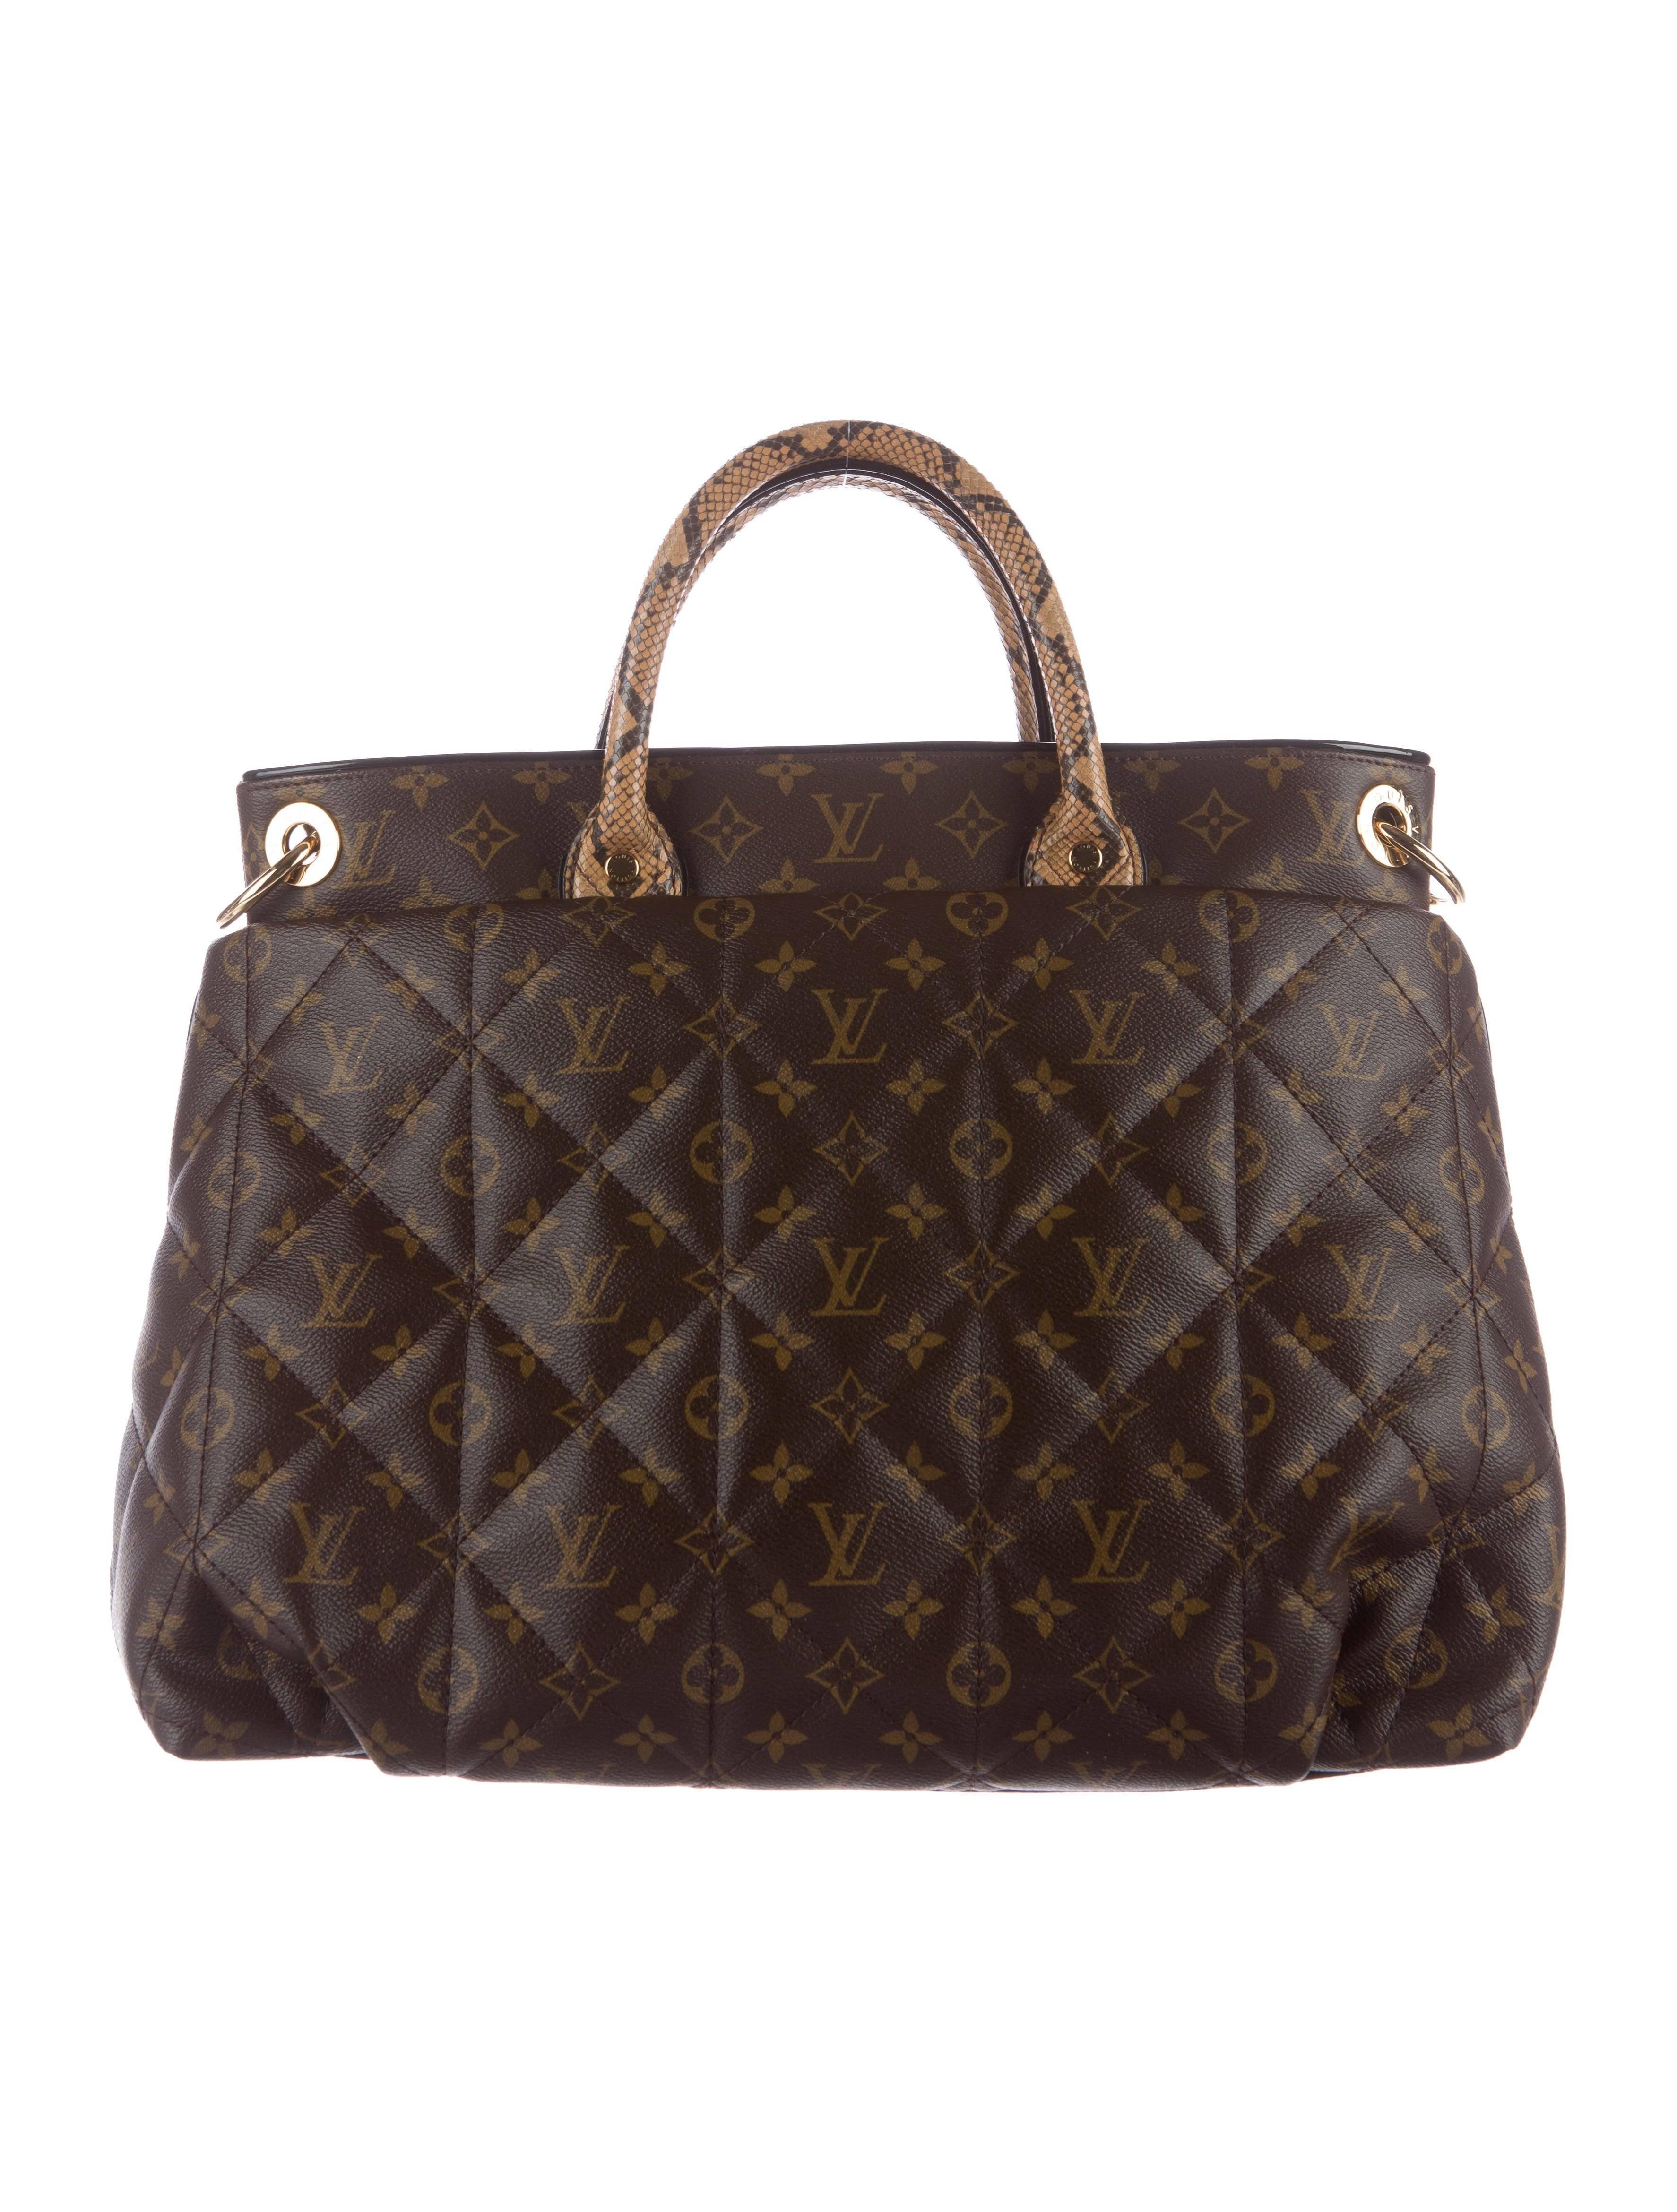 e25c88892b40 Louis Vuitton Monogram Python Large Men s Carryall Top Handle Tote Shoulder  Bag For Sale at 1stdibs